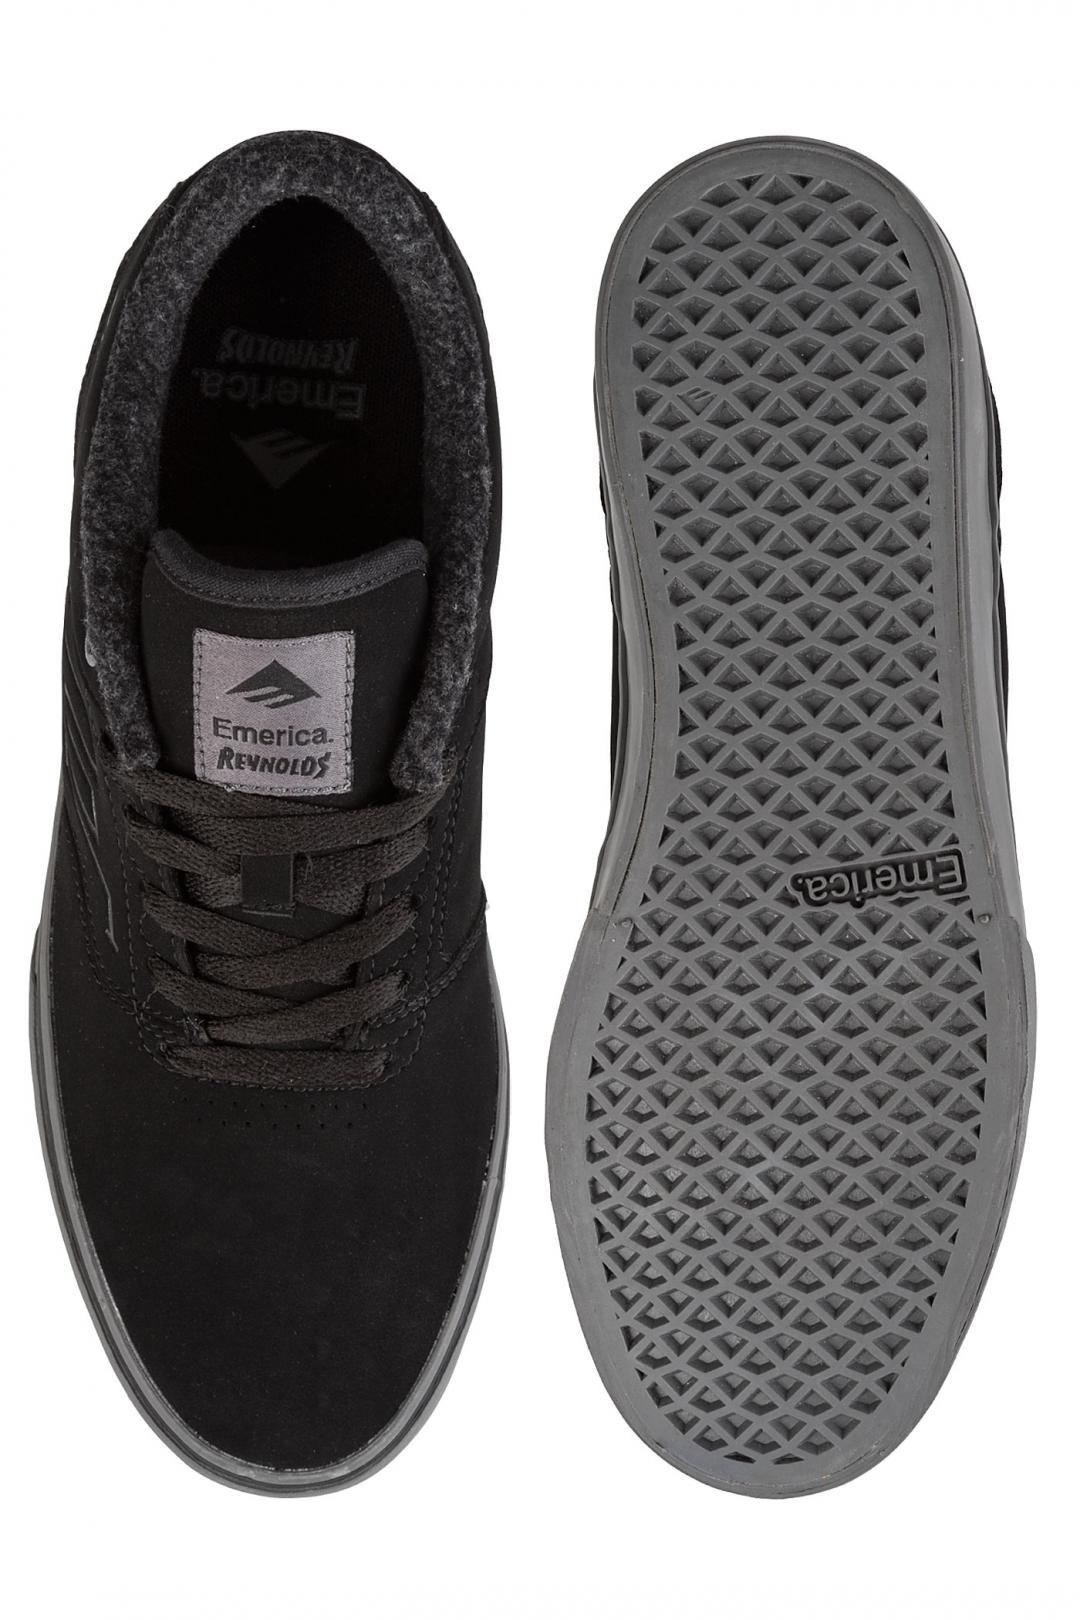 Uomo Emerica The Reynolds Low Vulc black grey | Scarpe da skate